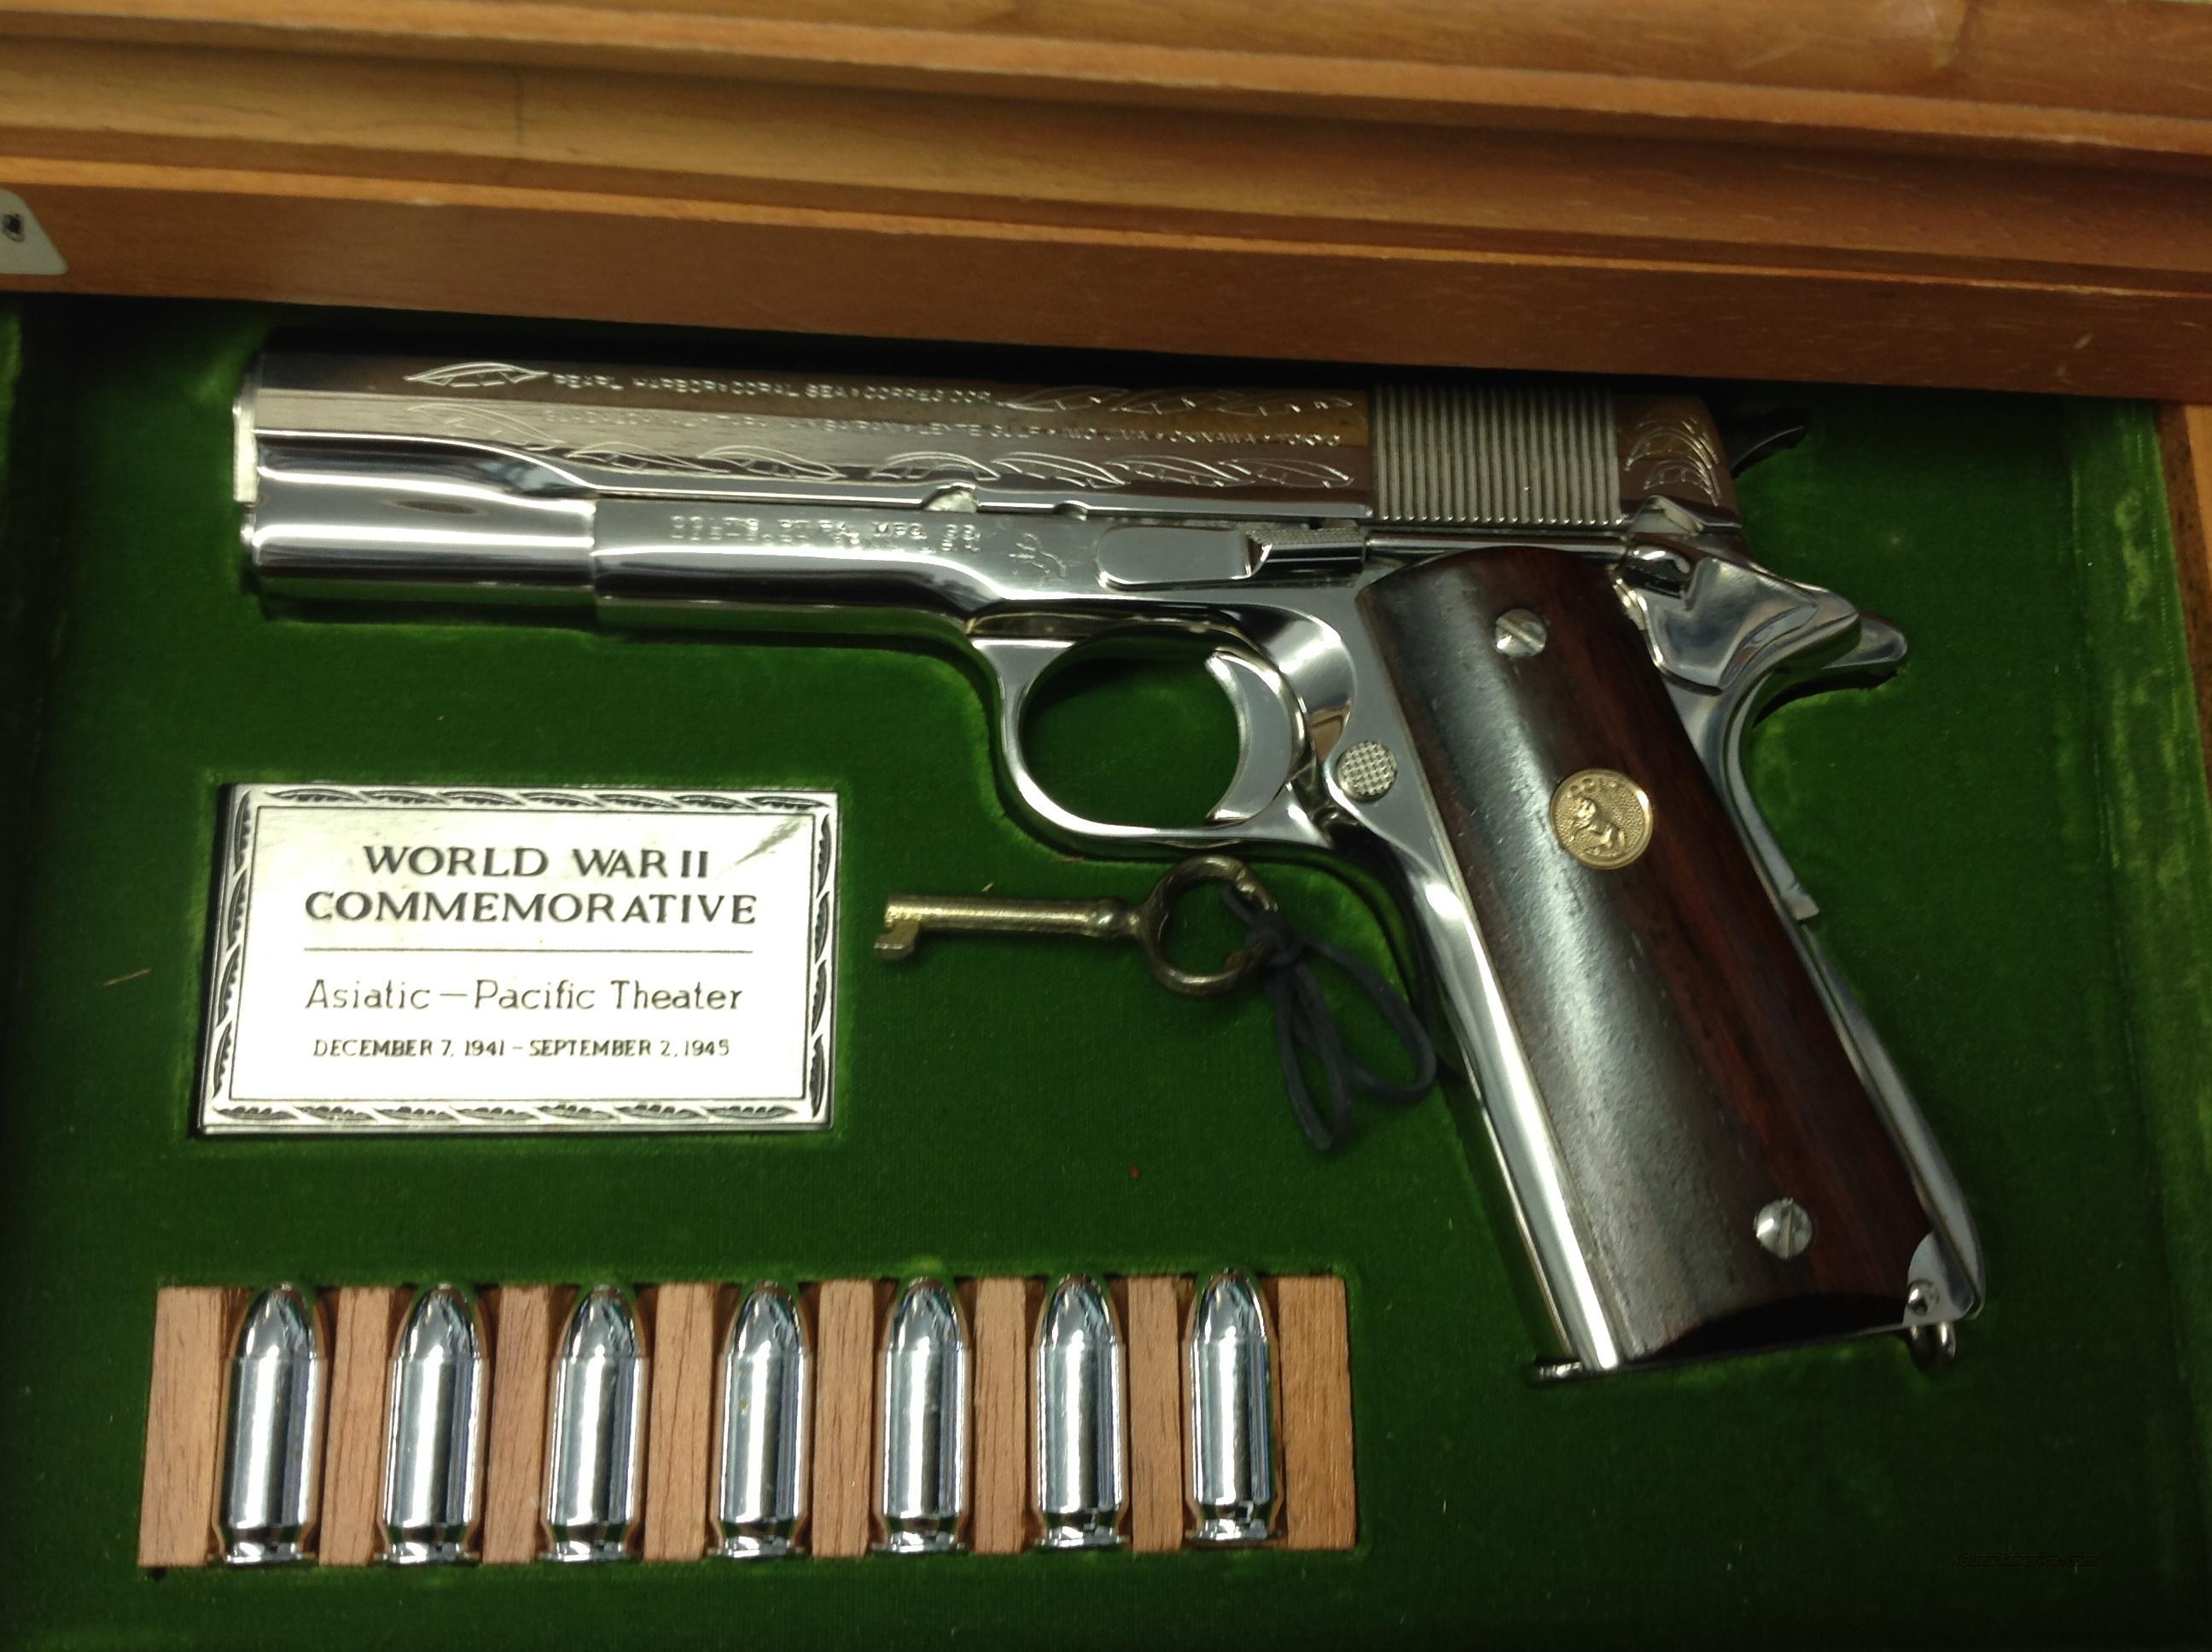 A1 Auto Sales >> Colt World War II Commemorative Asiatic - Pacif... for sale